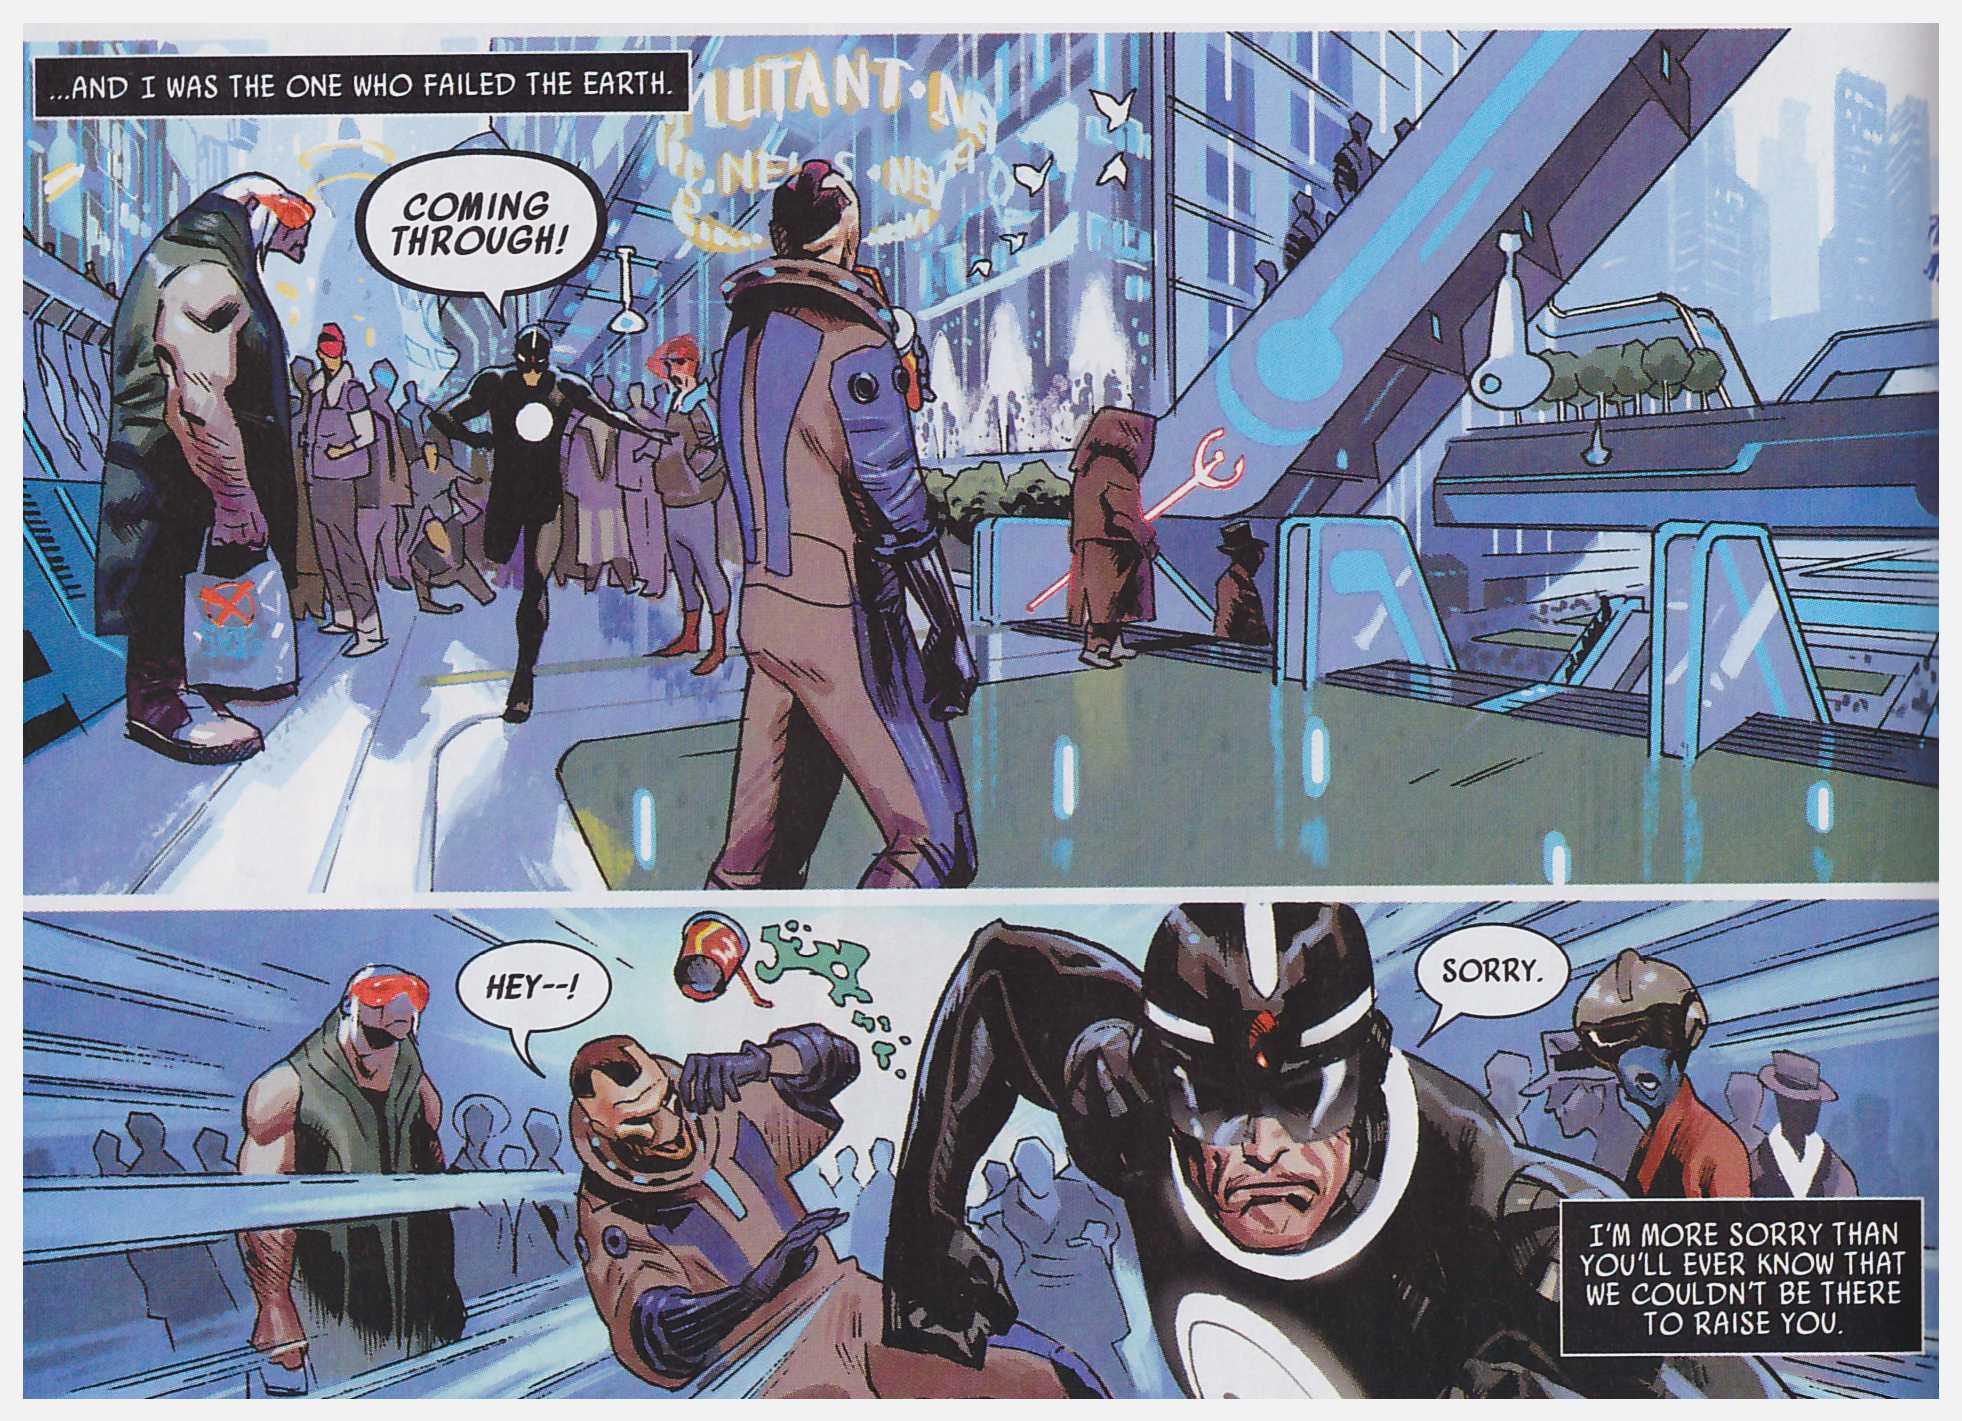 Uncanny Avengers Avenge the Earth review